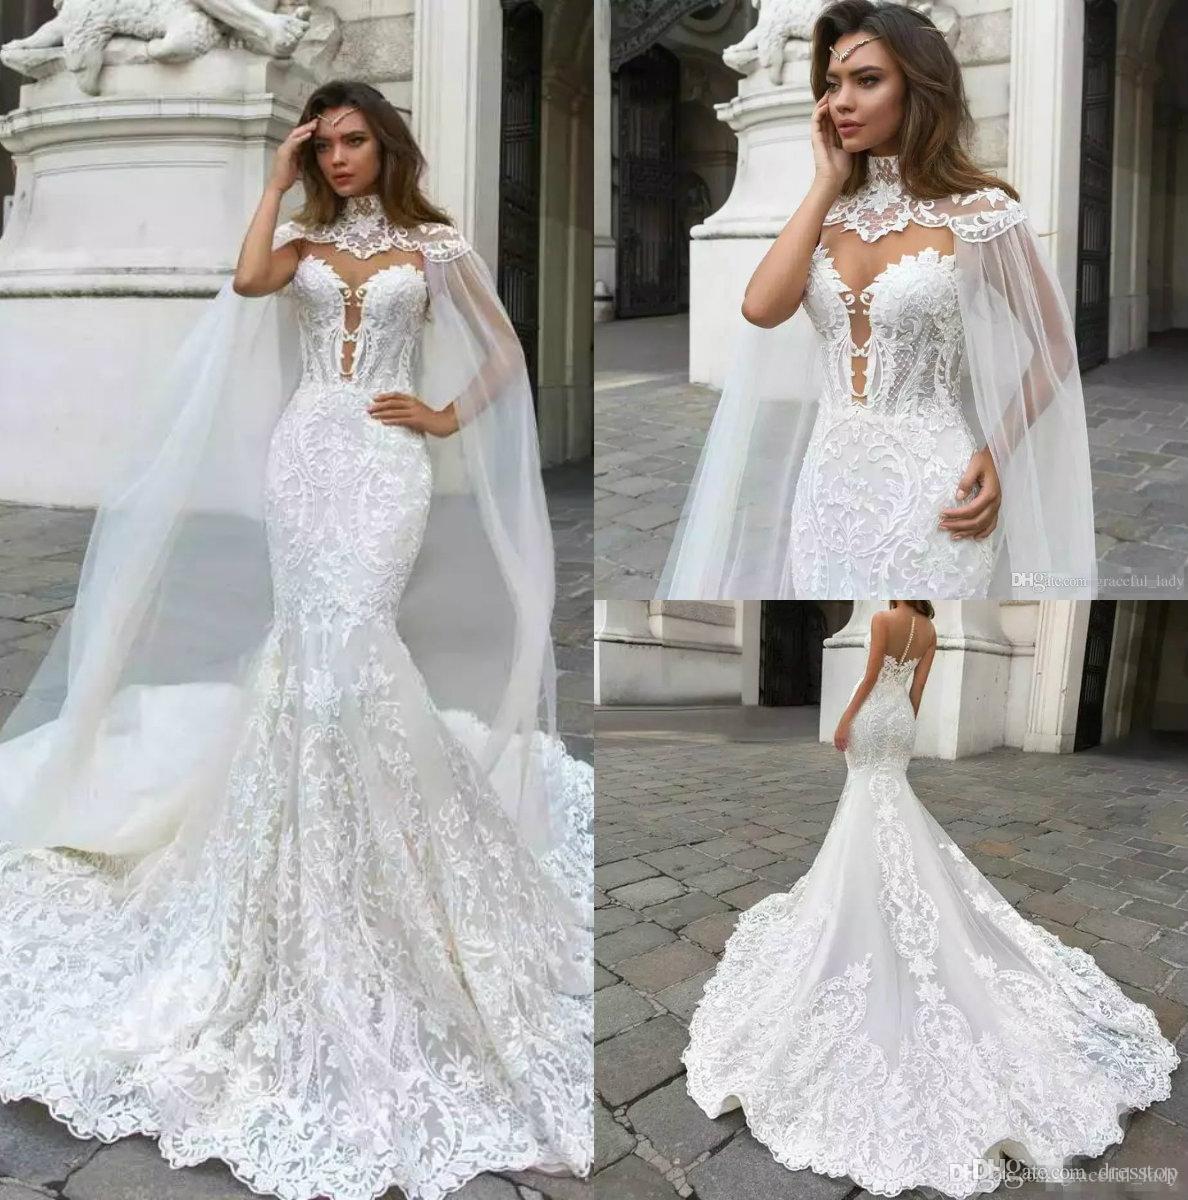 363ffd8a8 Vestidos De Noiva Importados 2018 Praia Sereia Vestidos De Casamento Sheer  Neck Lace Vestidos De Noiva Com Capa Vestido De Novia Boho Plus Size Vestido  De ...